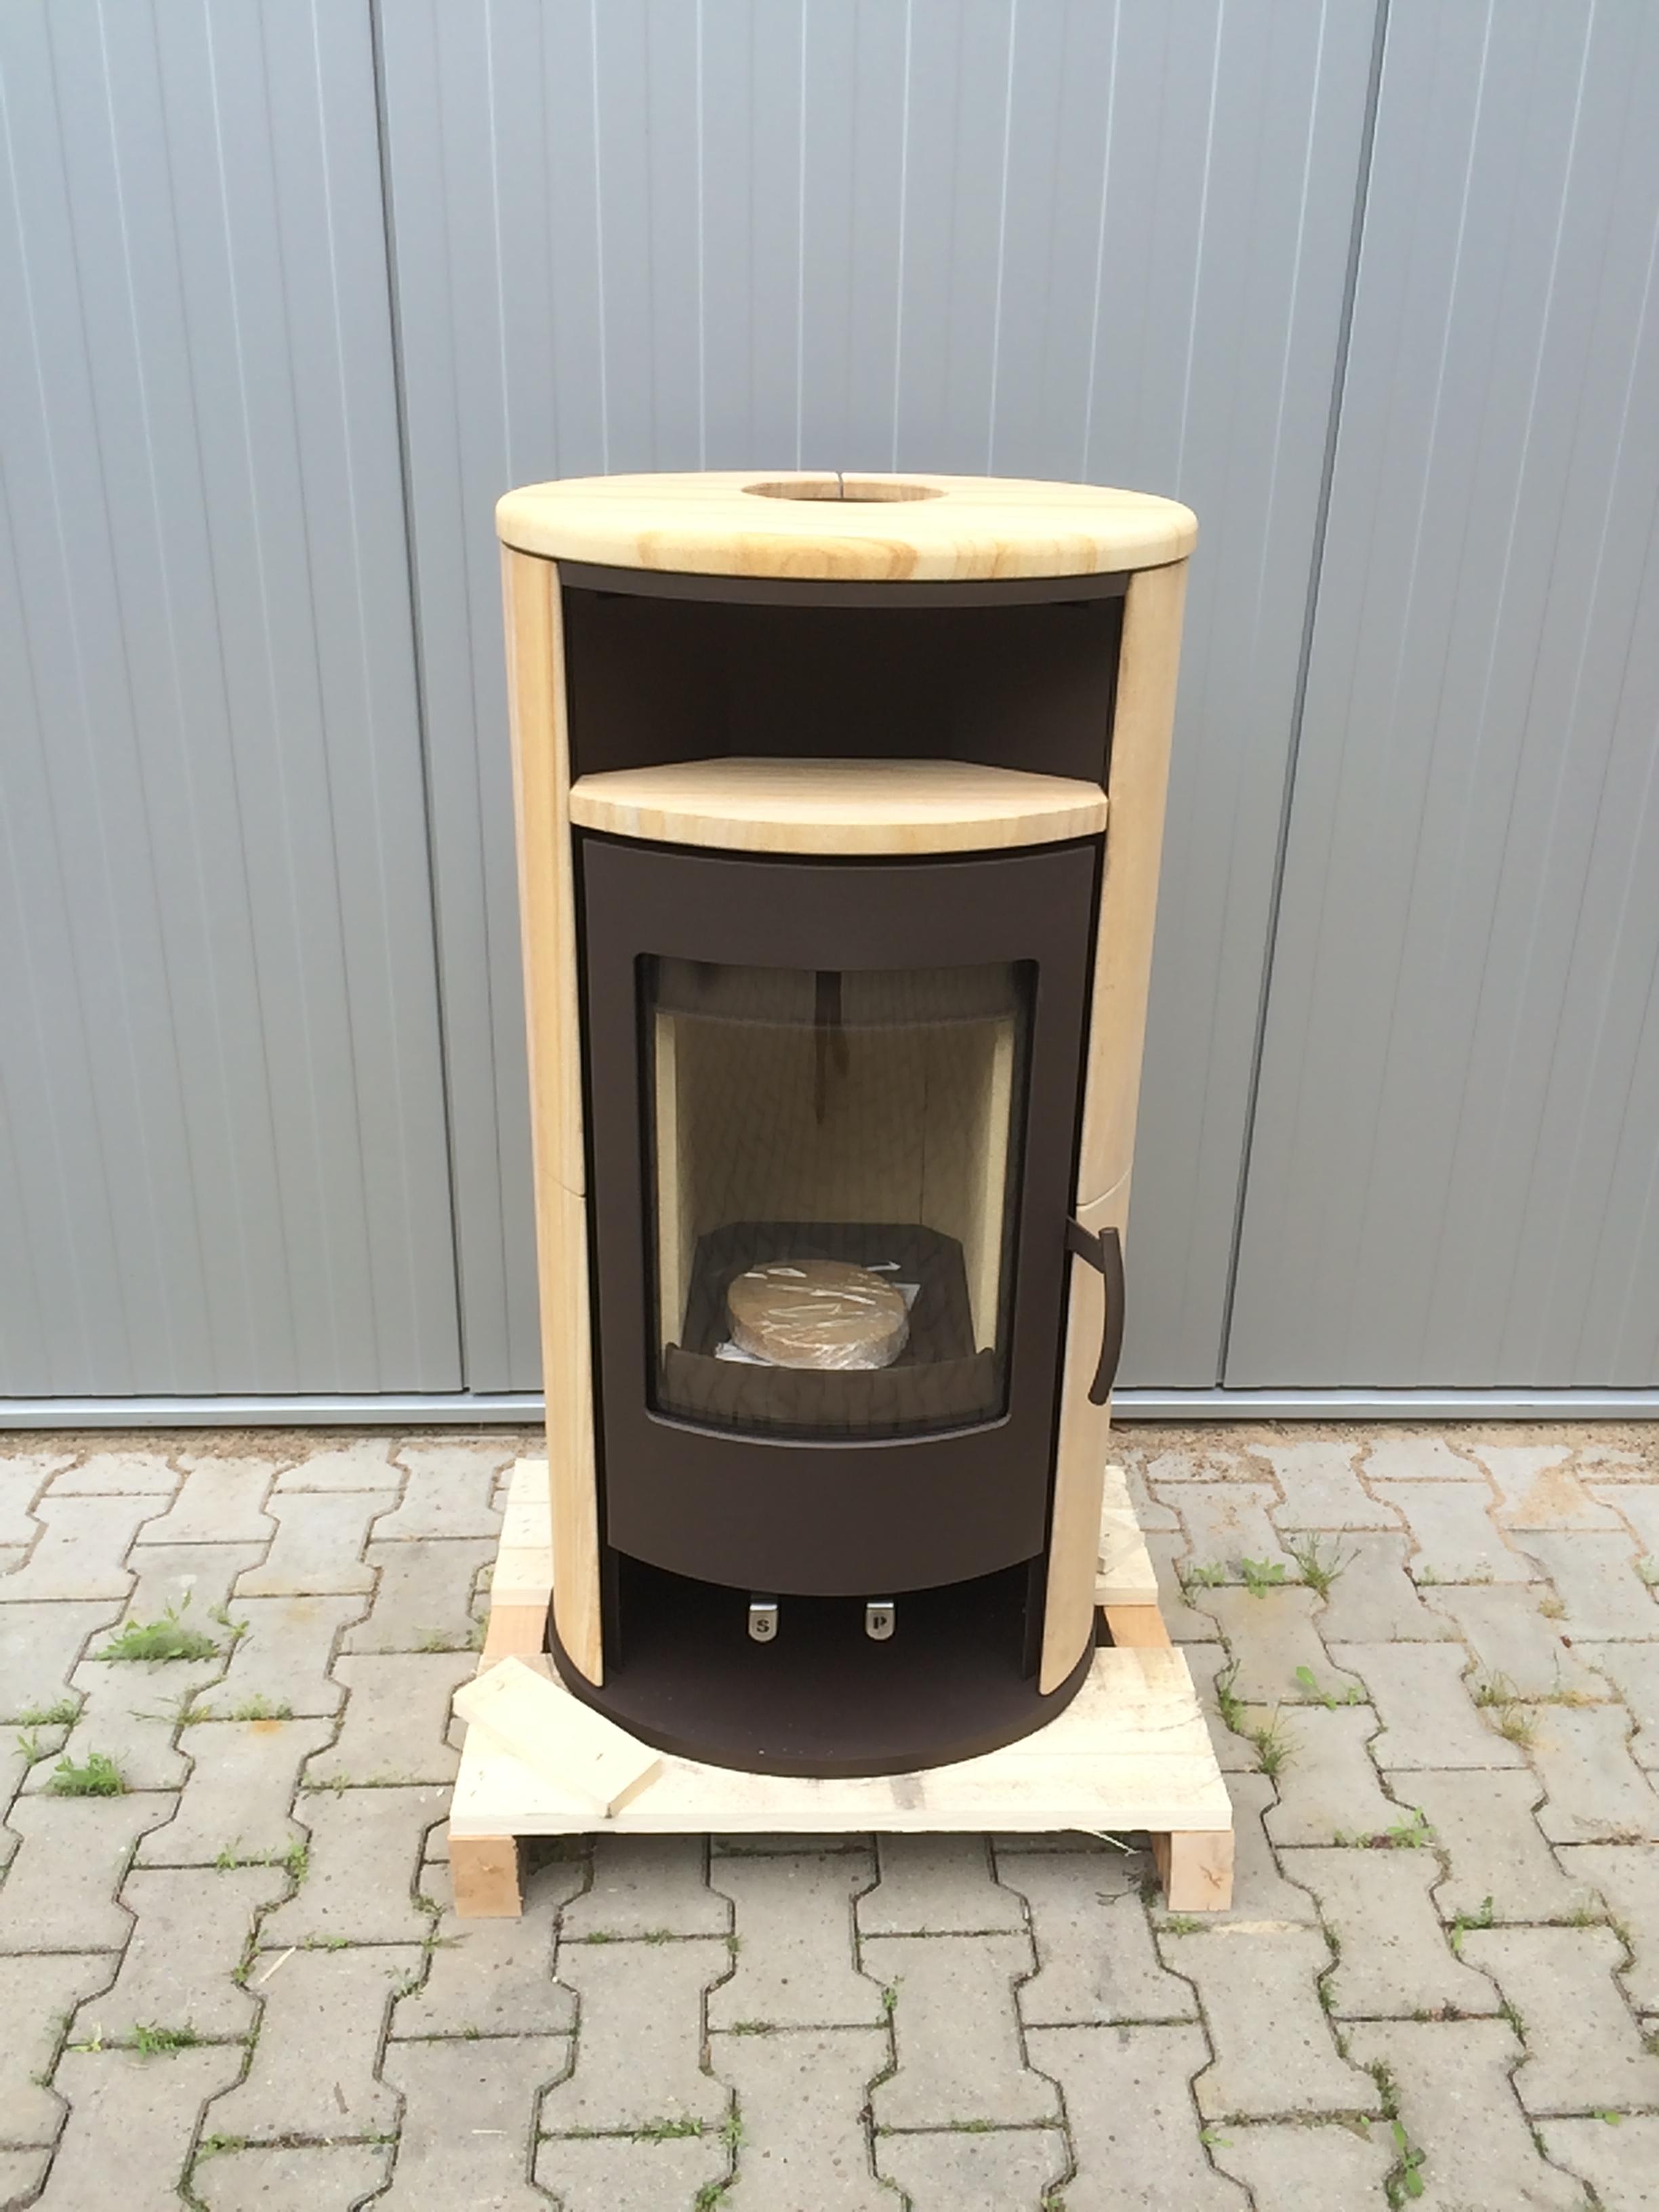 h m kaminofen basic 2 0 braun sandstein 2 wahl ebay. Black Bedroom Furniture Sets. Home Design Ideas